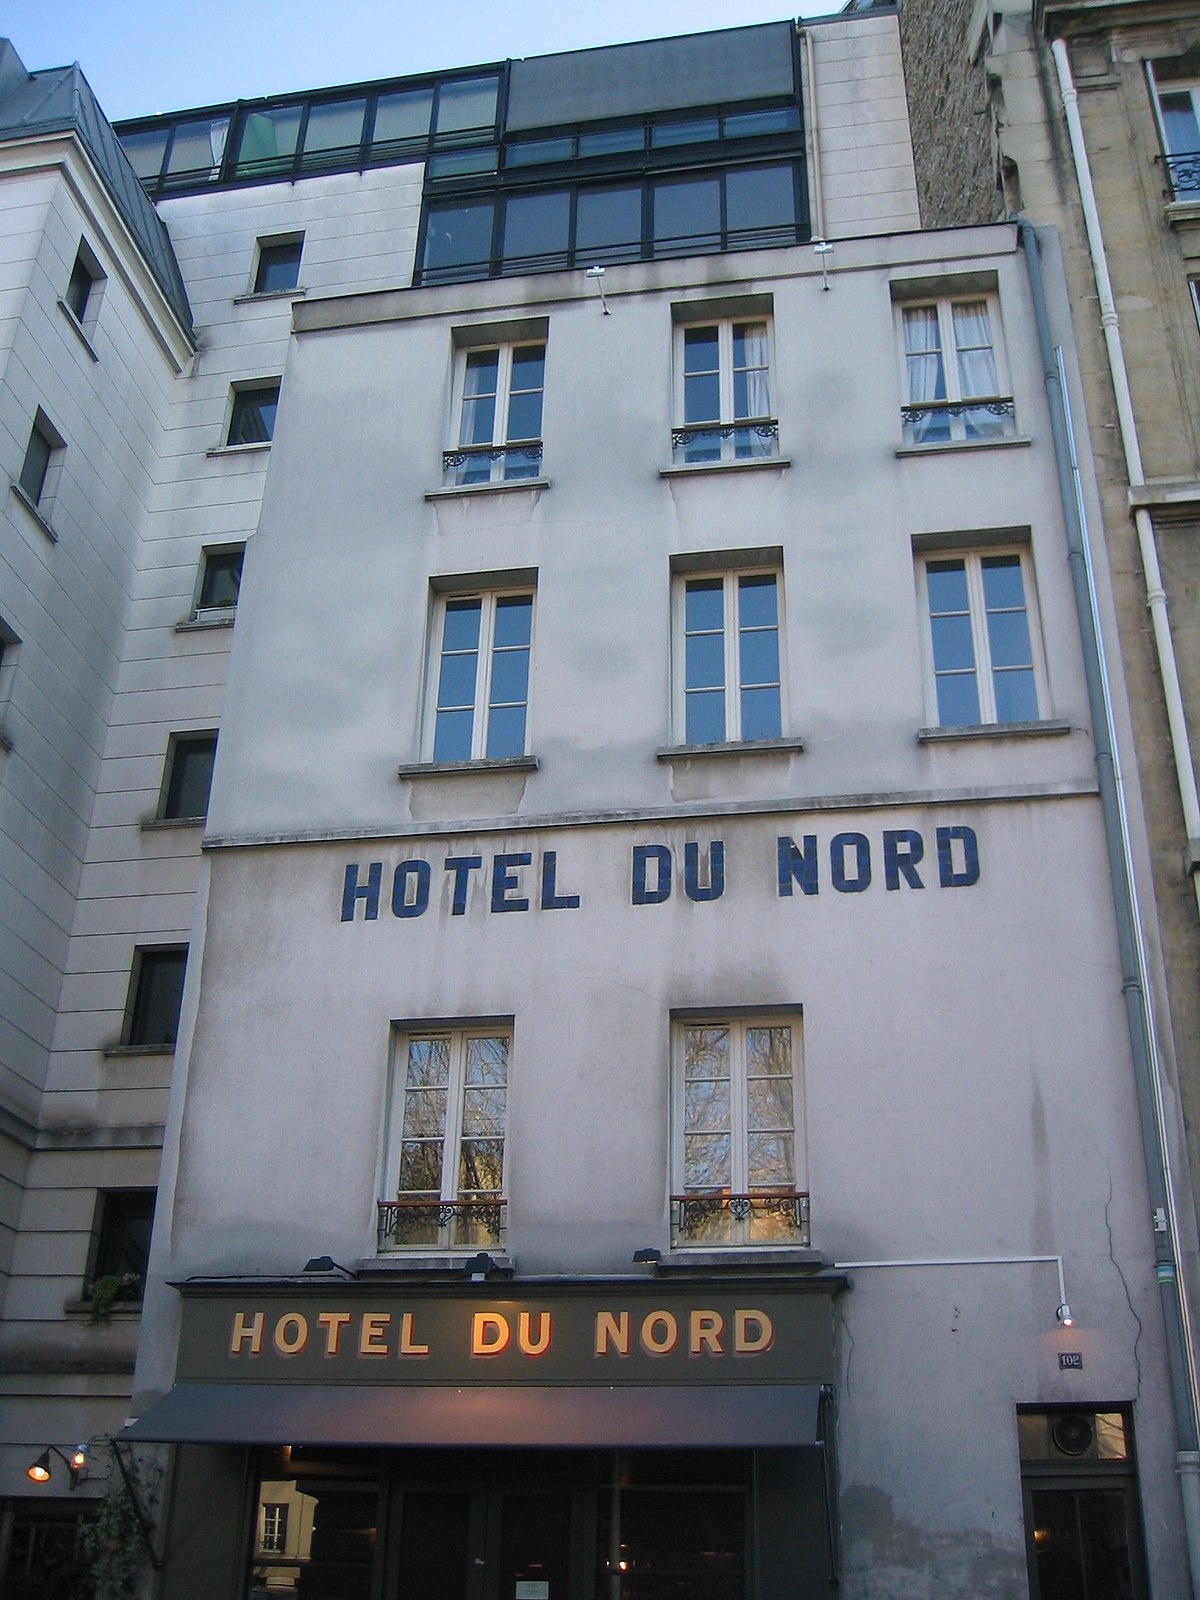 Hotel du nord wikipedia wolna encyklopedia for Decor hotel du nord